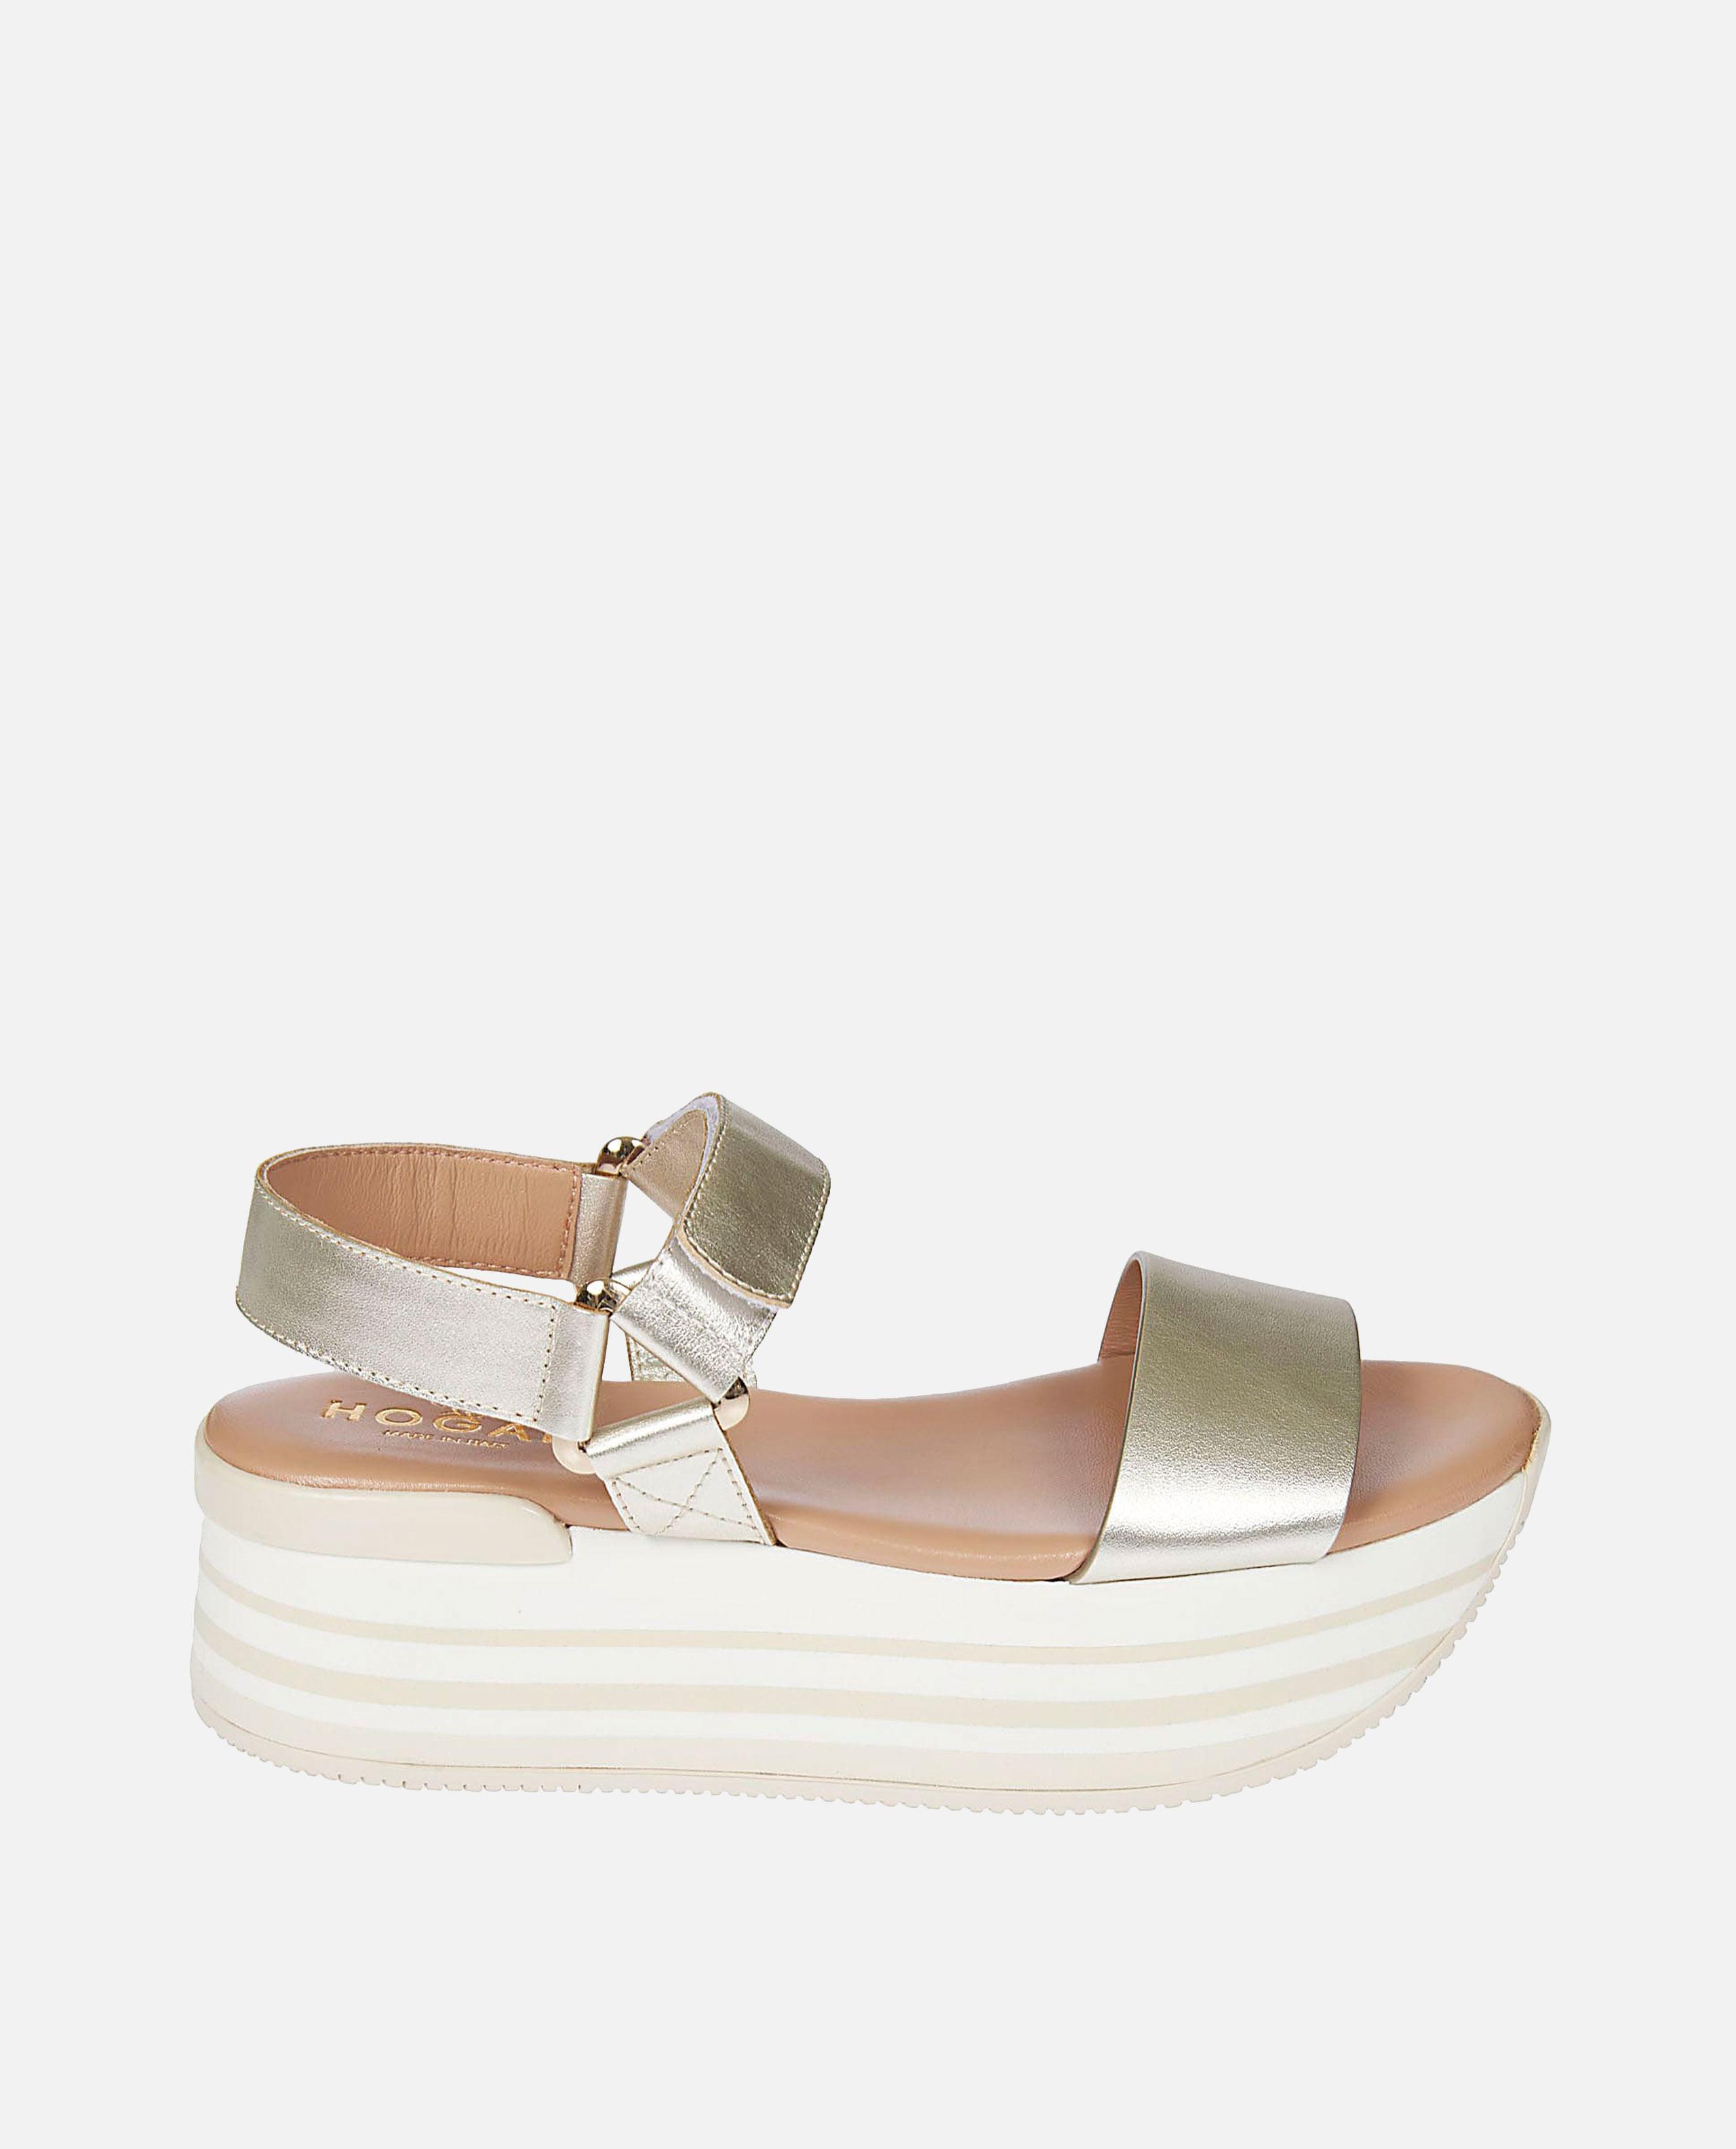 H294 Hogan sandals